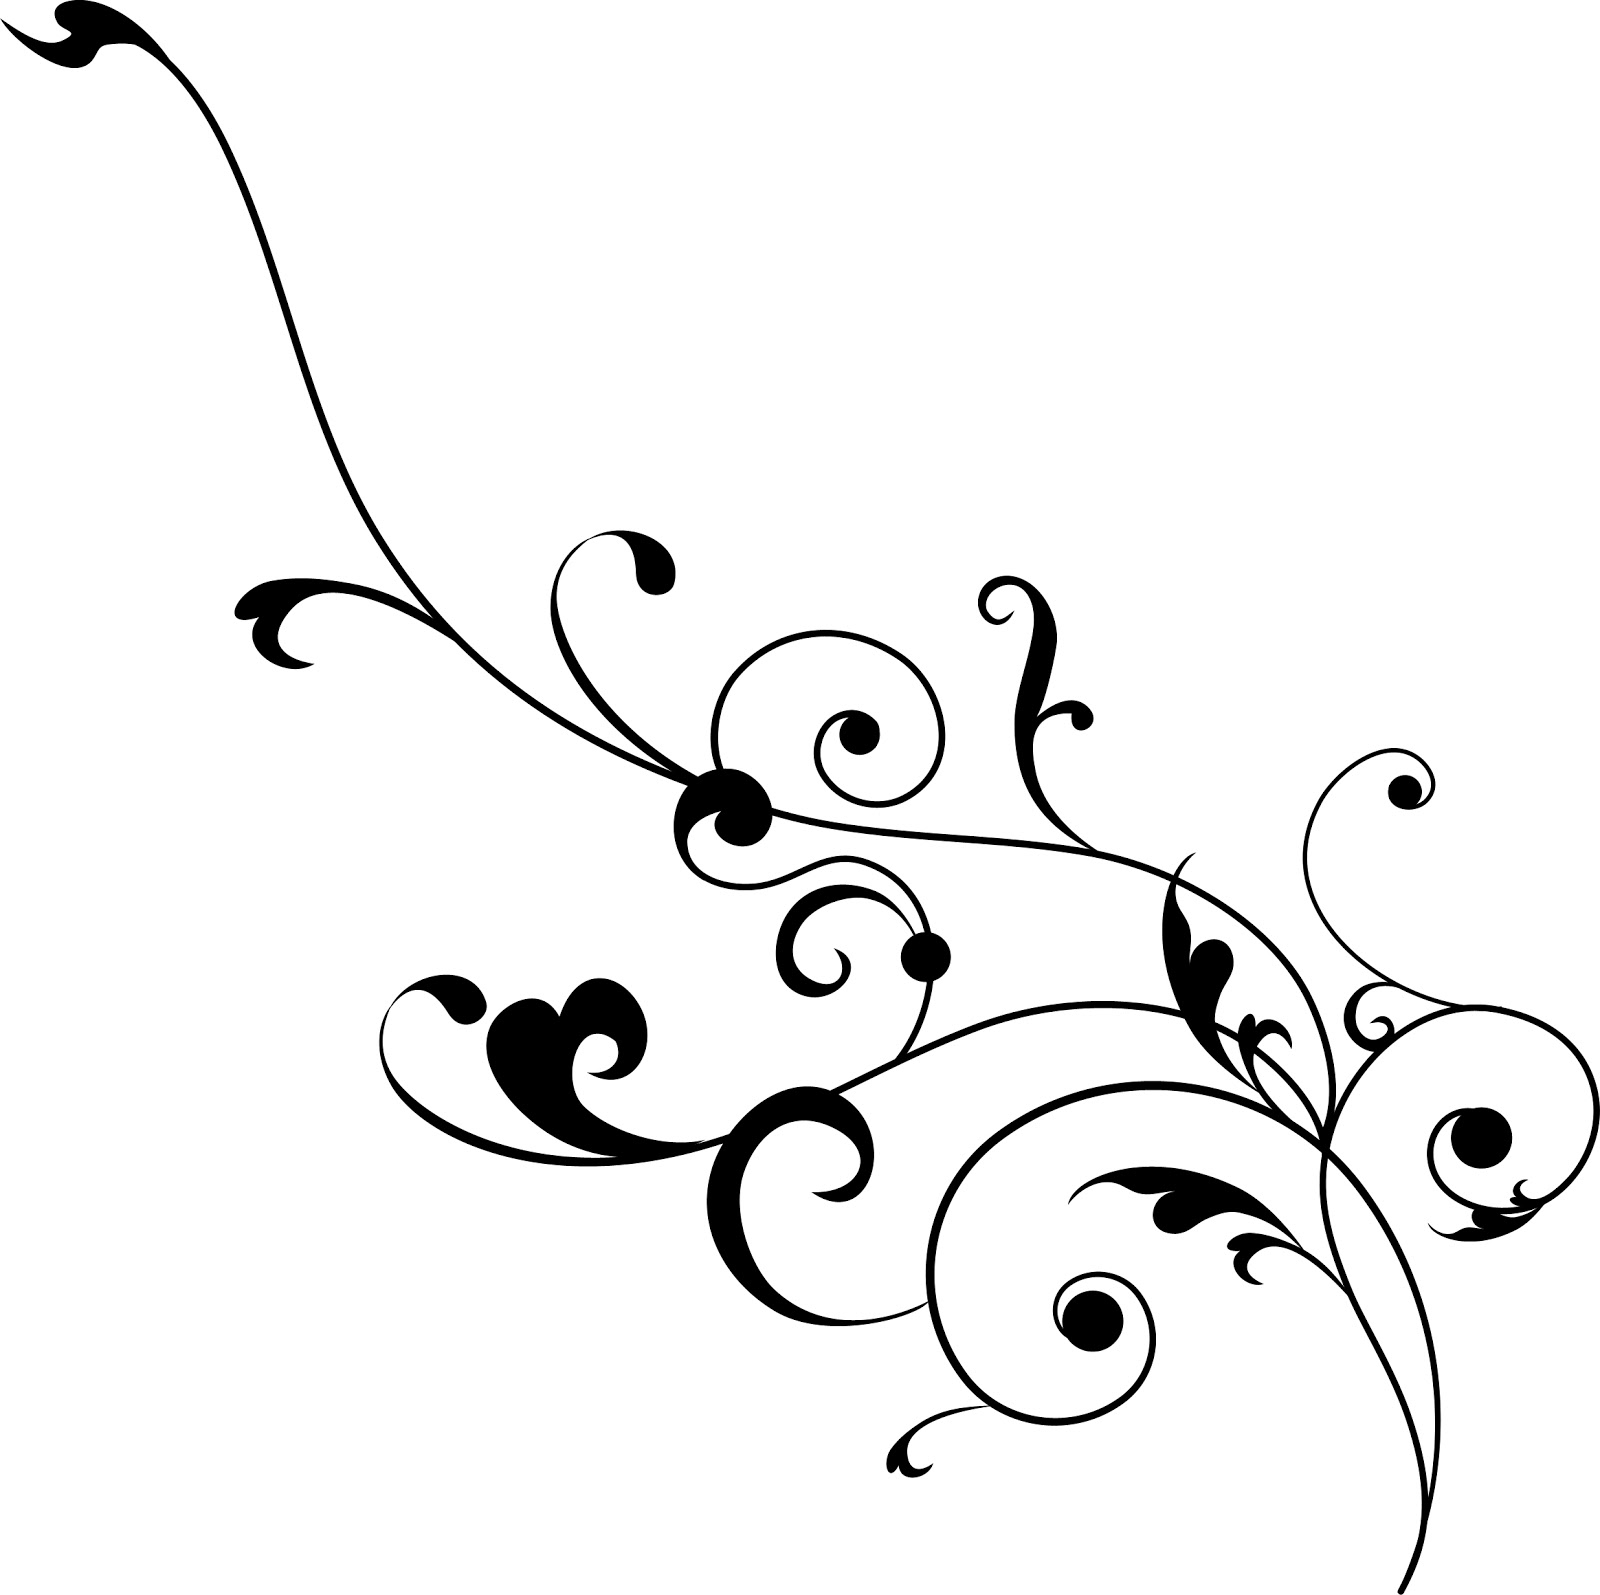 Free Swirl Designs